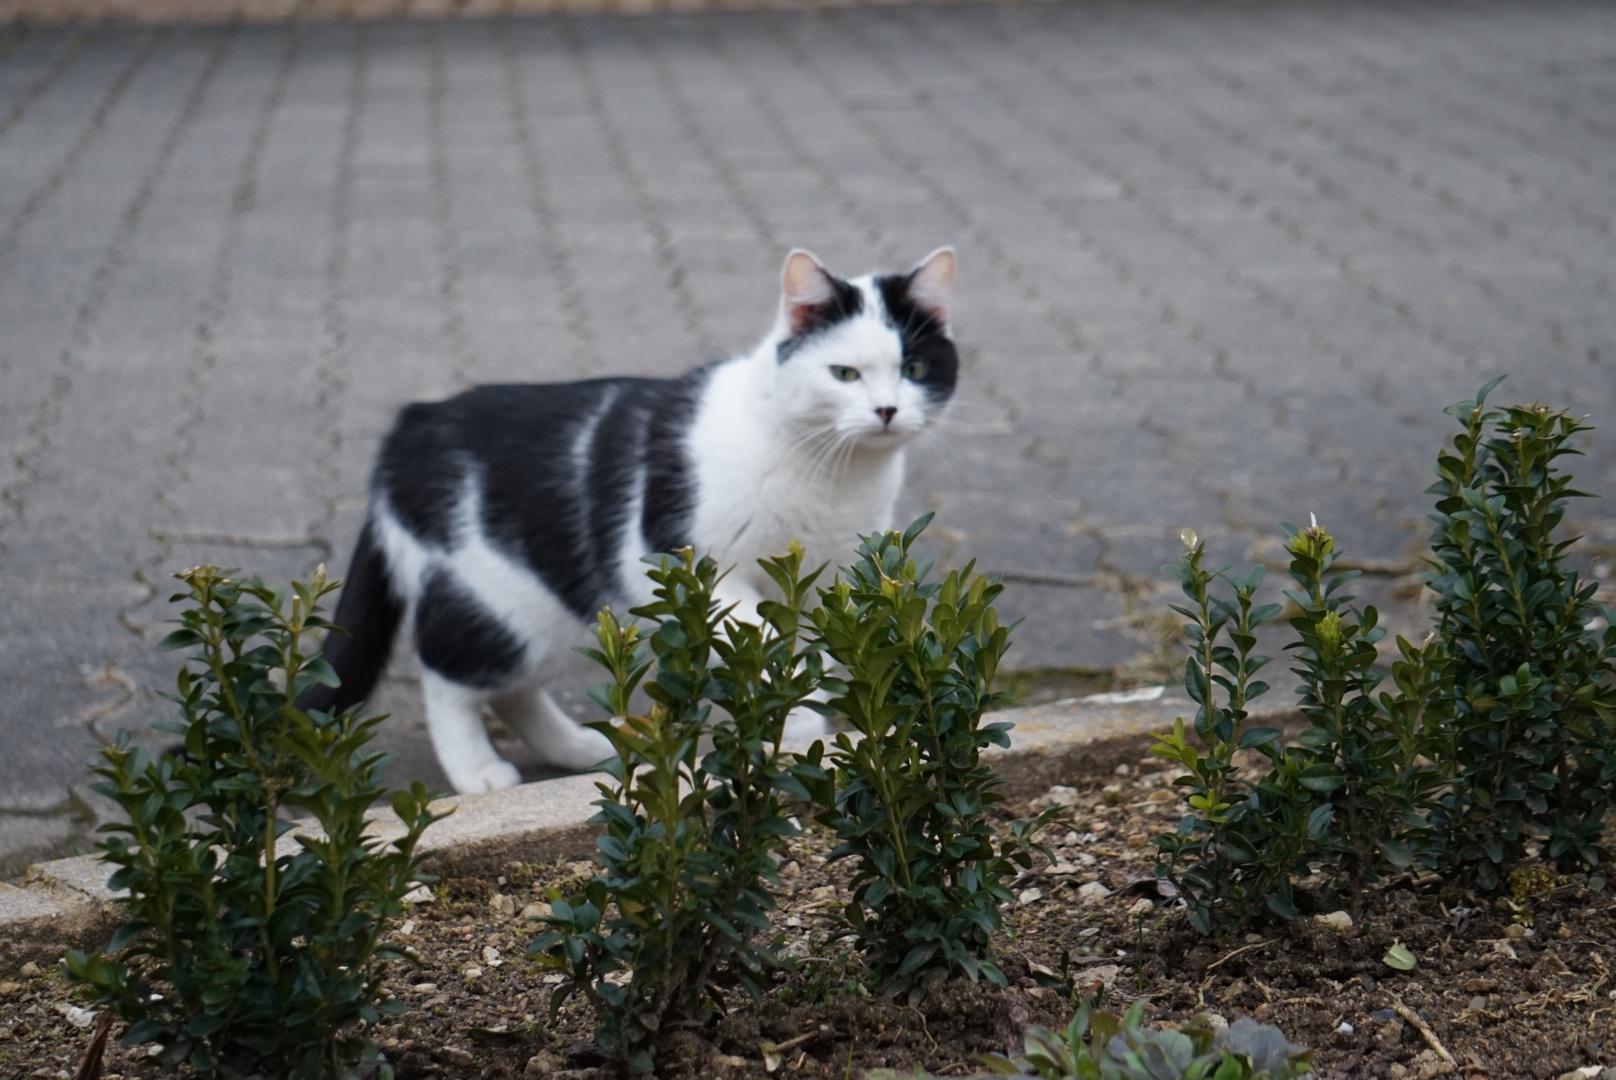 Katze by SUNNY_MK5